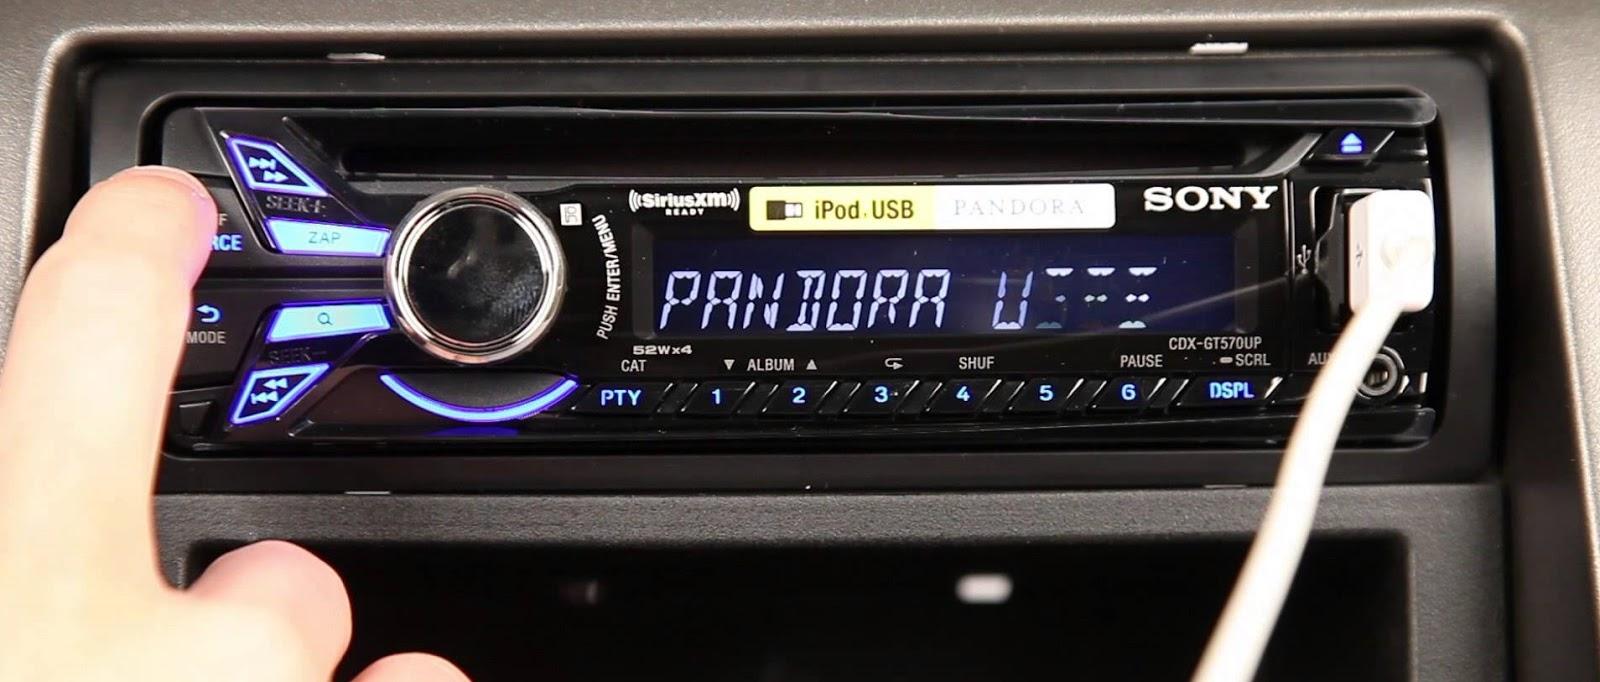 Harman Kardon Car Audio: How To Fix Sony Car Stereo USB Not Supported Problem